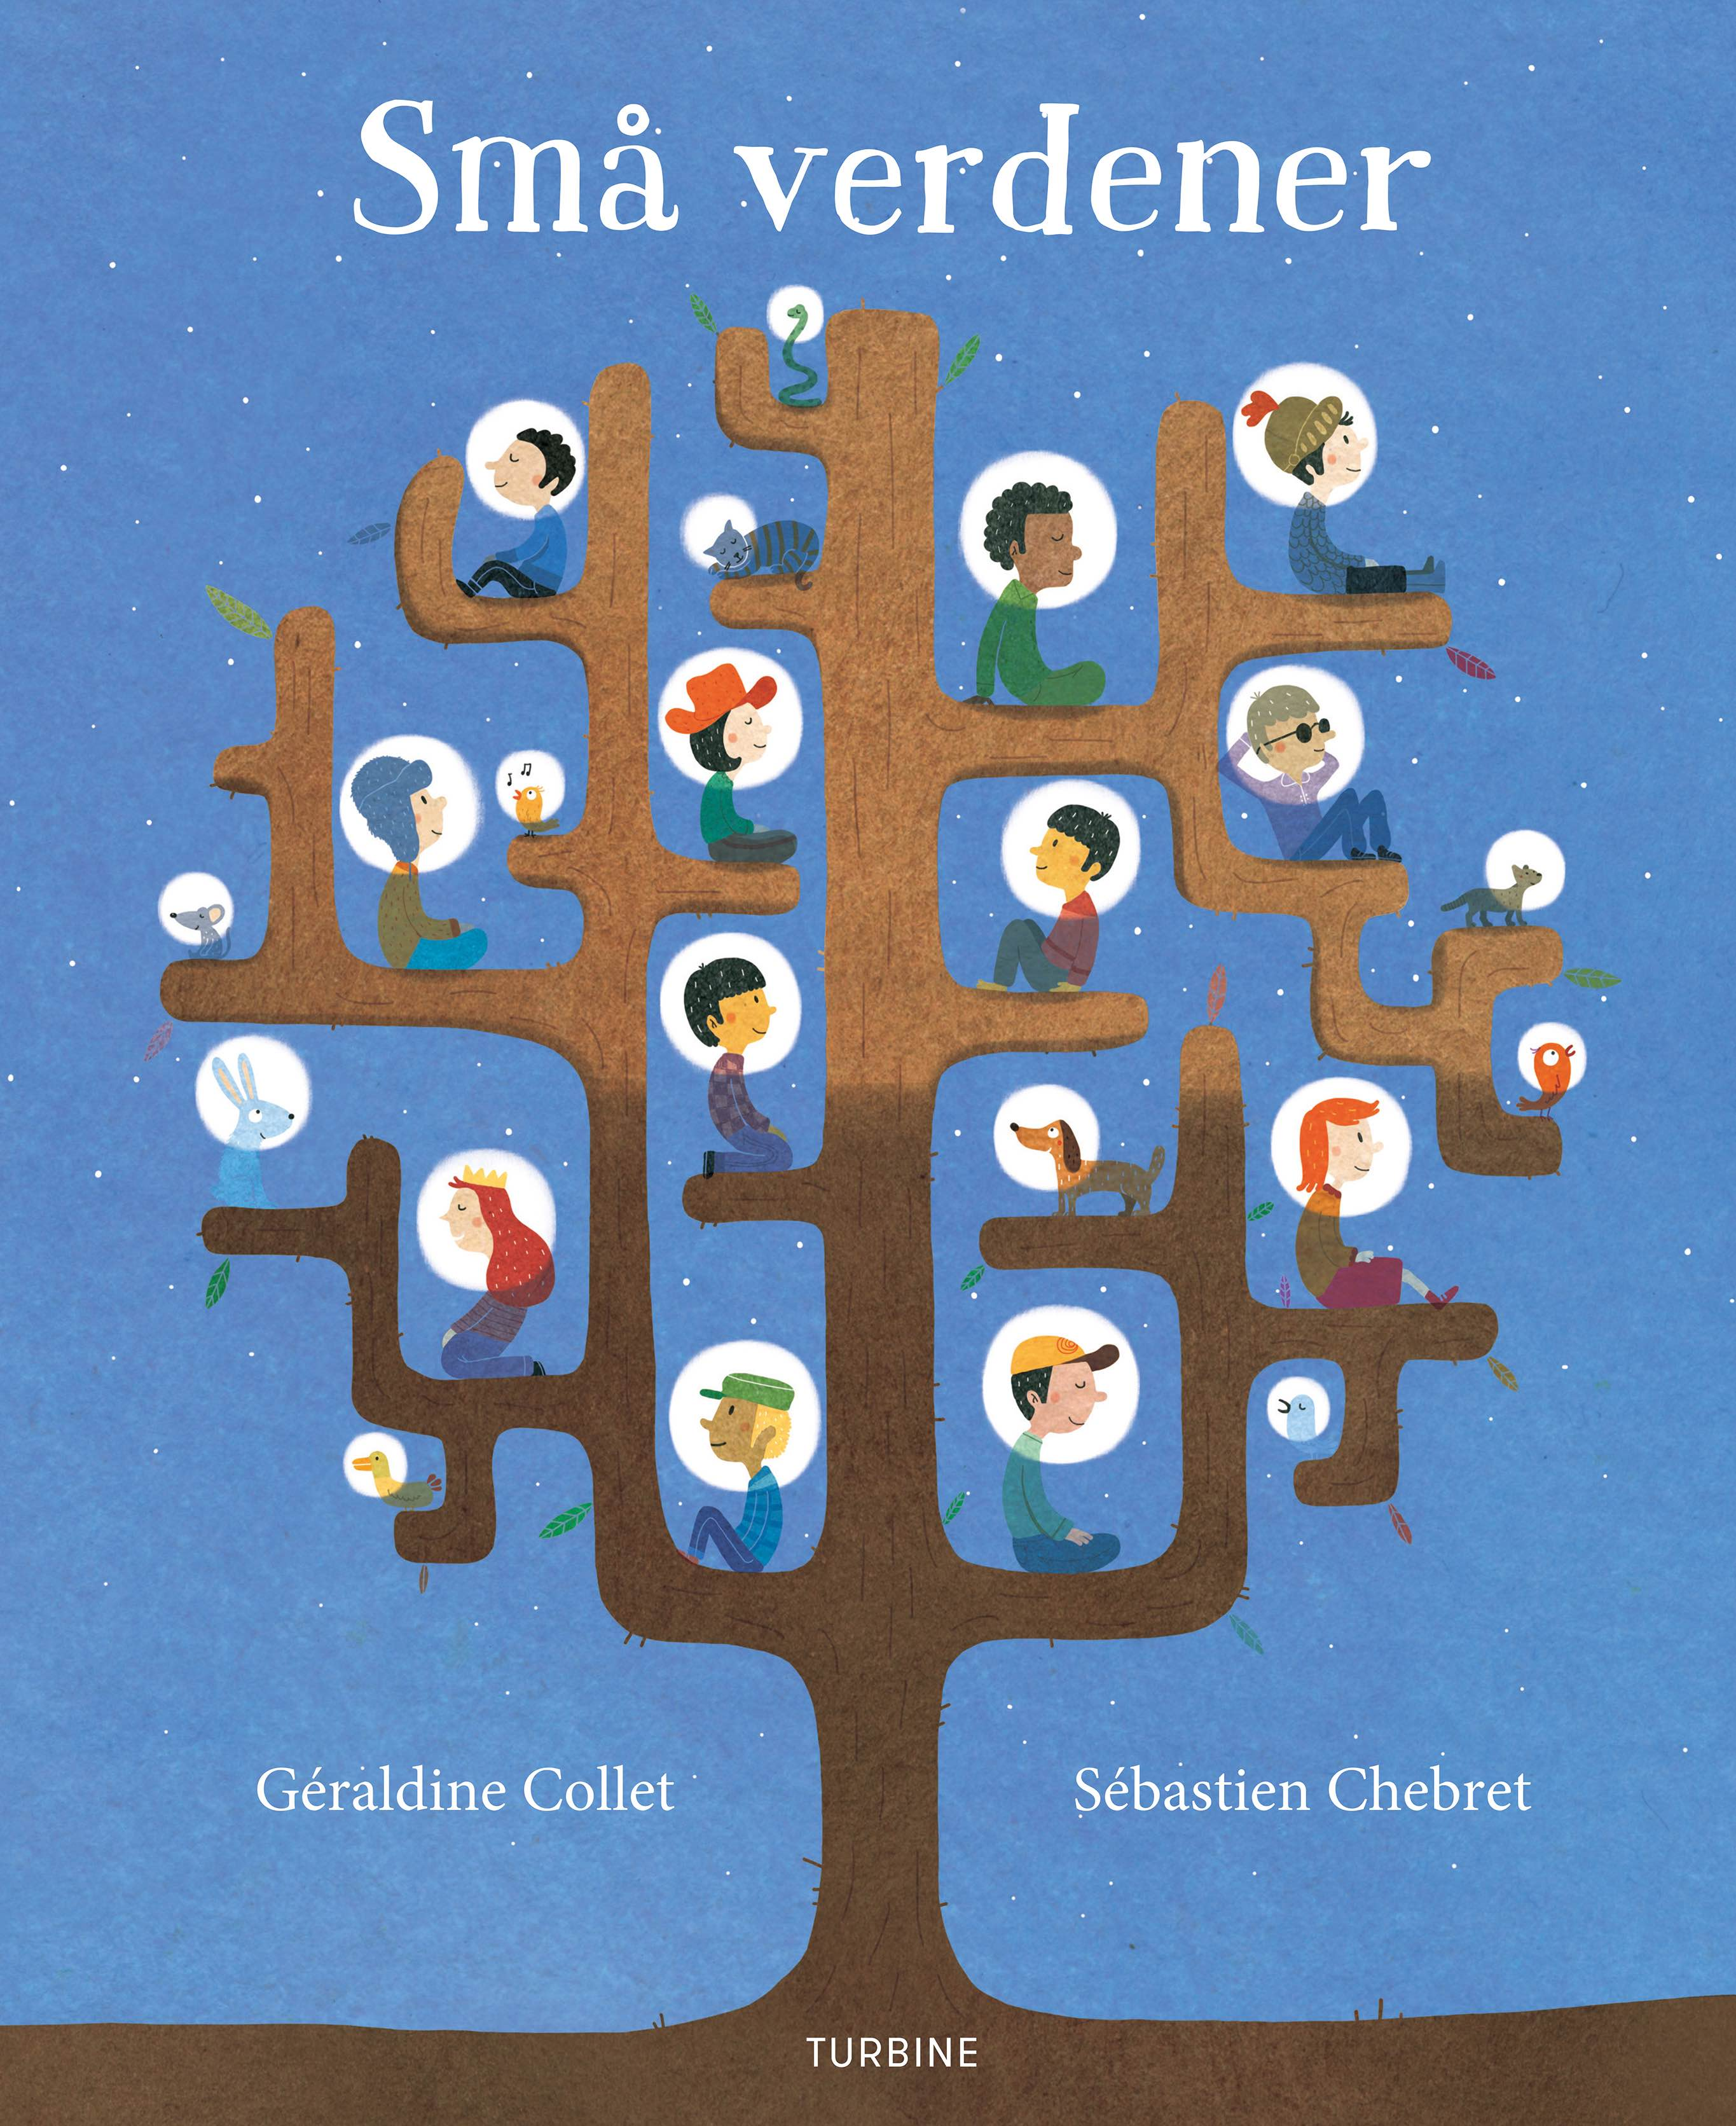 Små verdener - Géraldine Collet - Bøger - Turbine - 9788740620016 - May 17, 2018